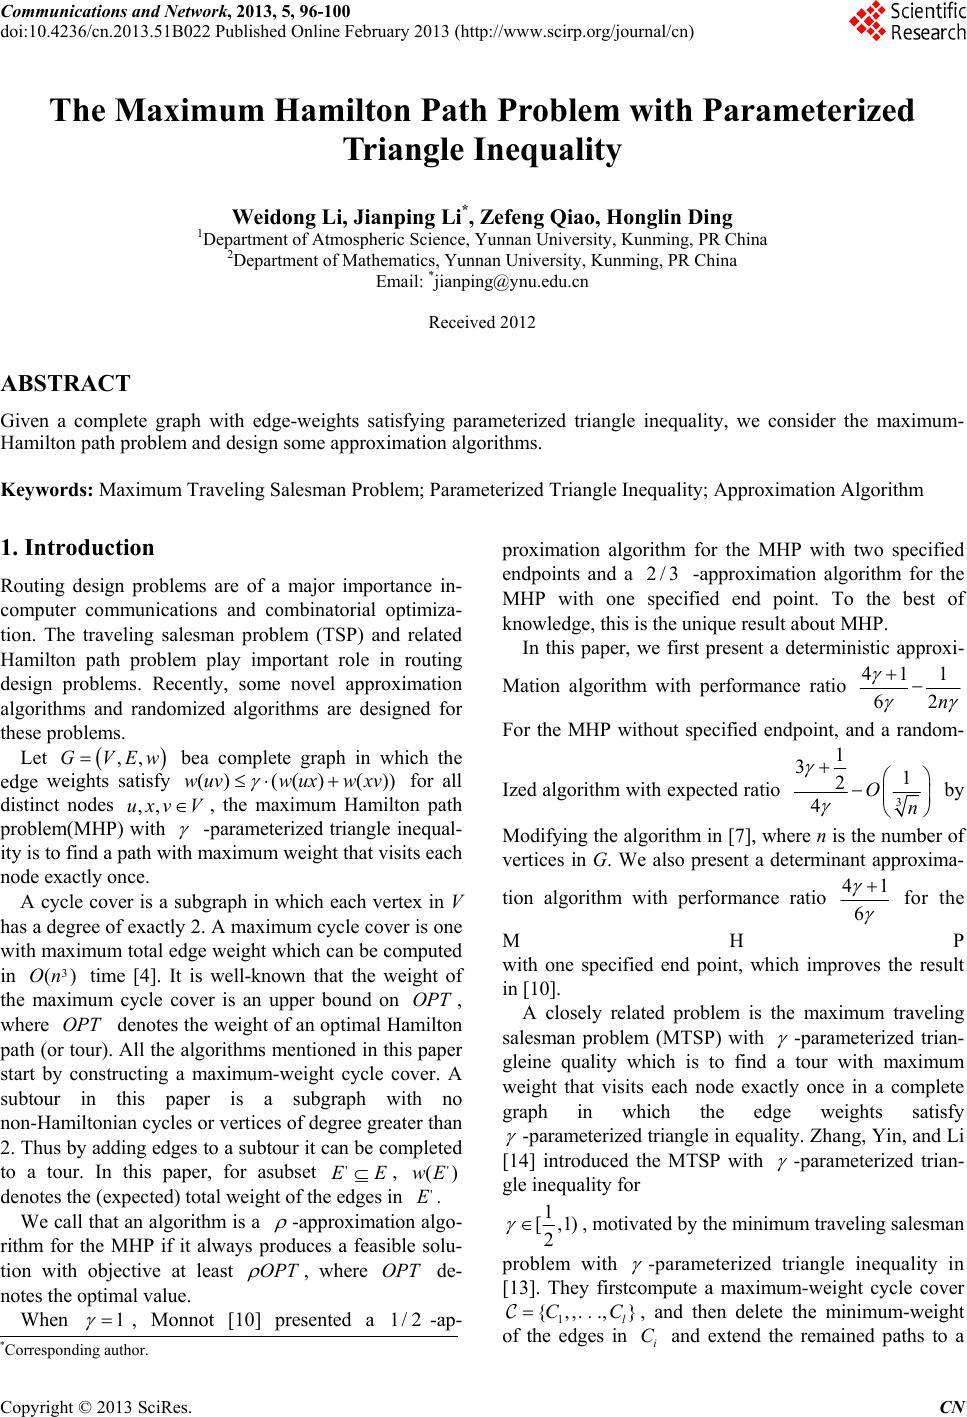 The Maximum Hamilton Path Problem With Parameterized Triangle Inequality